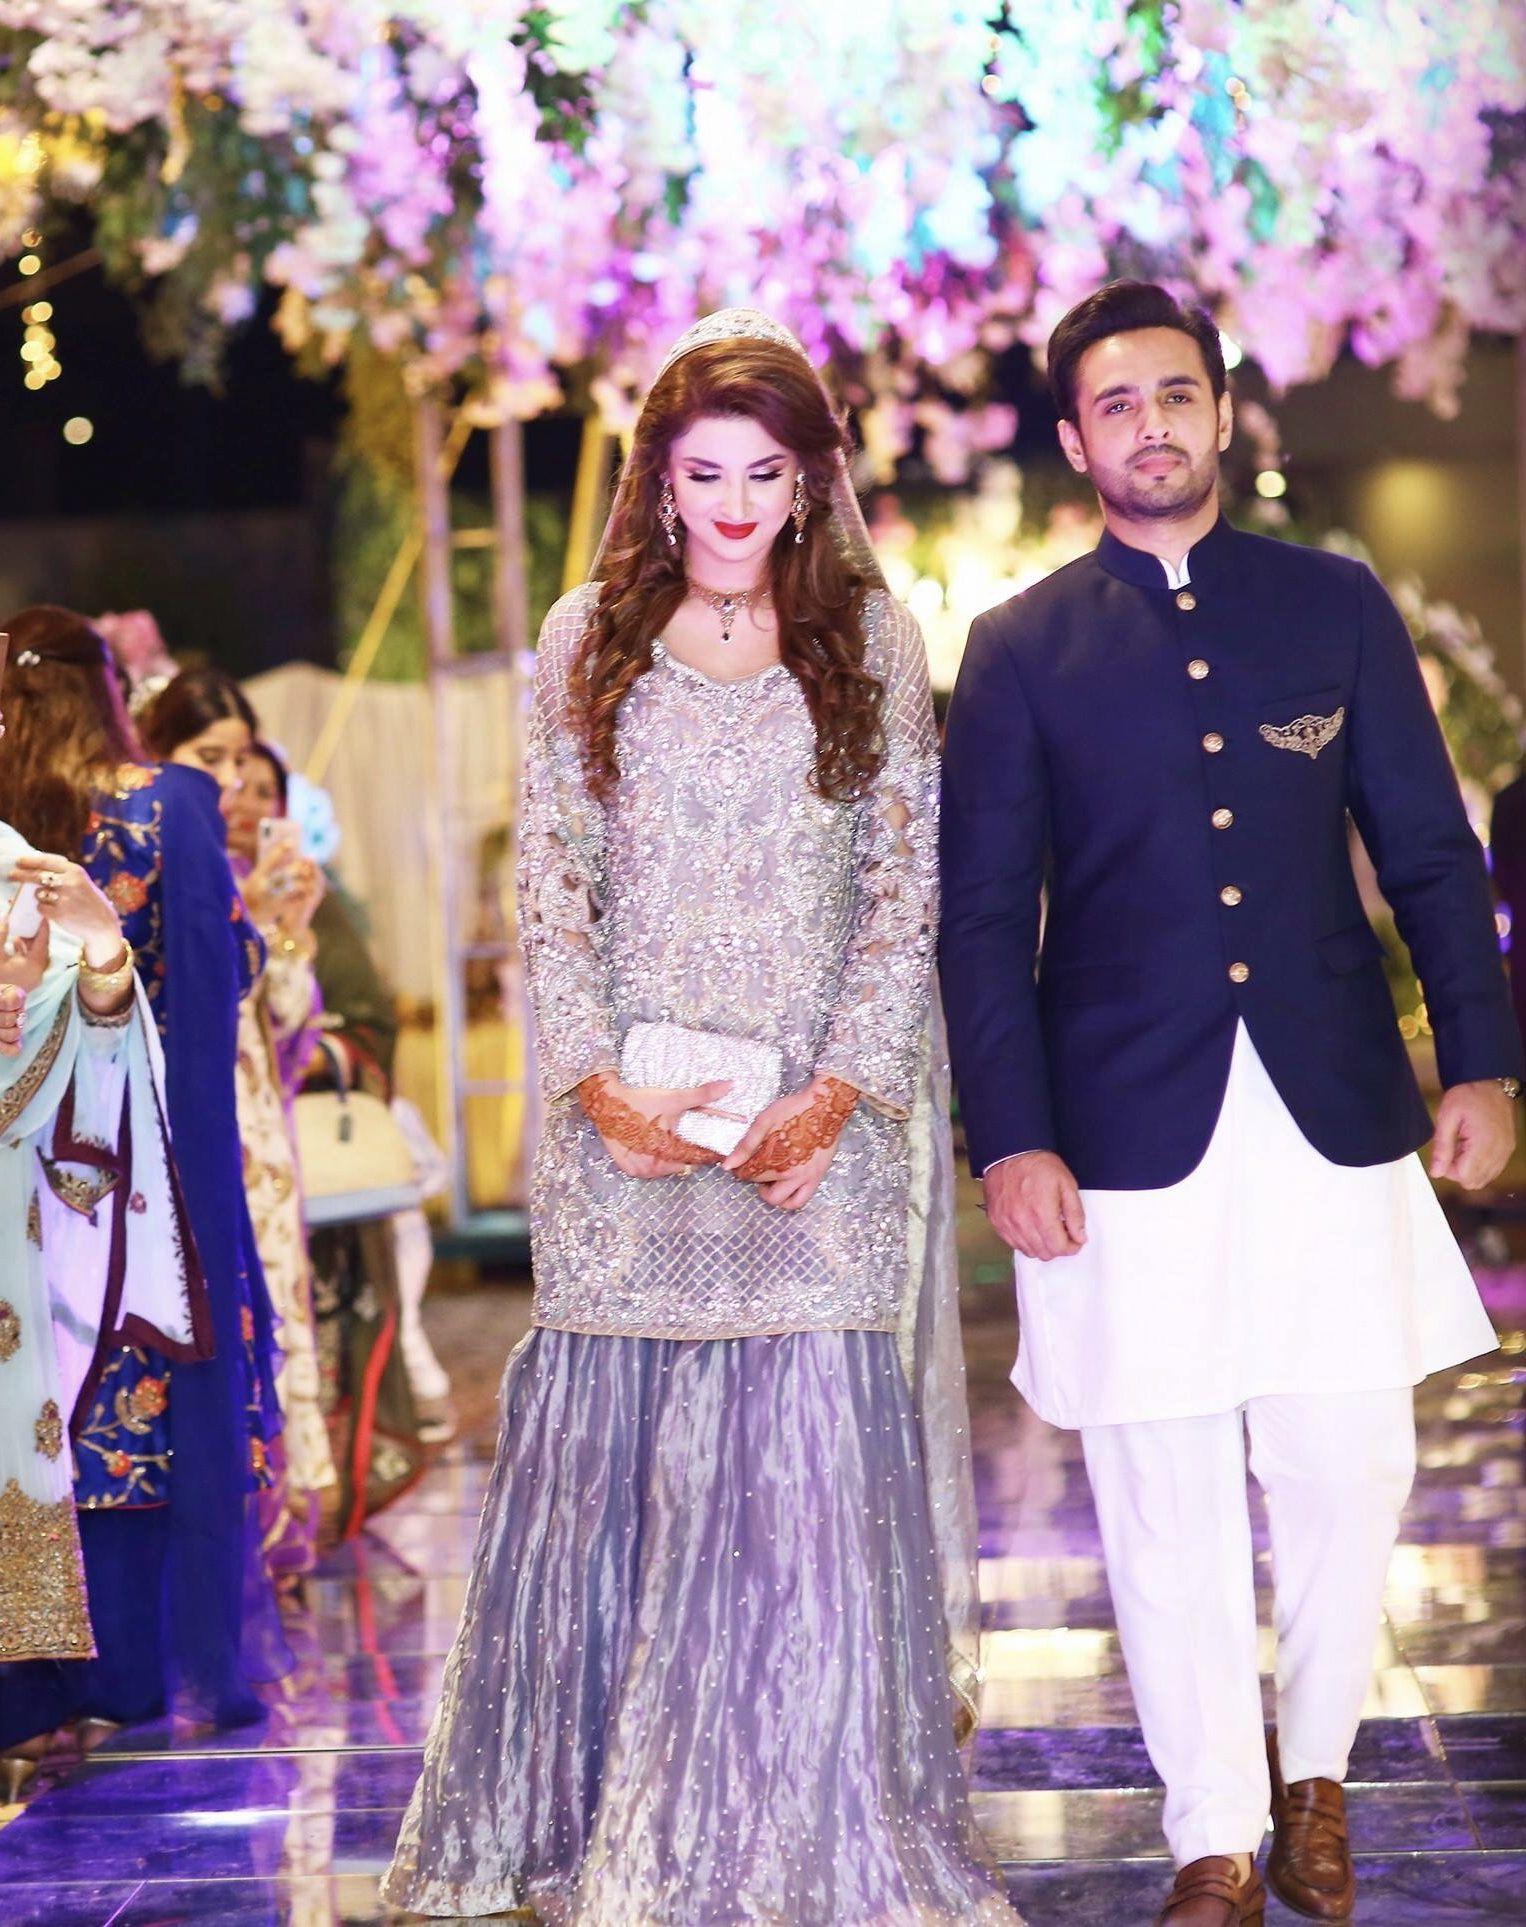 Engagement Pakistani Wedding Outfits Engagement Dress For Groom Pakistani Engagement Dresses,Autumn Wedding Guest Dresses